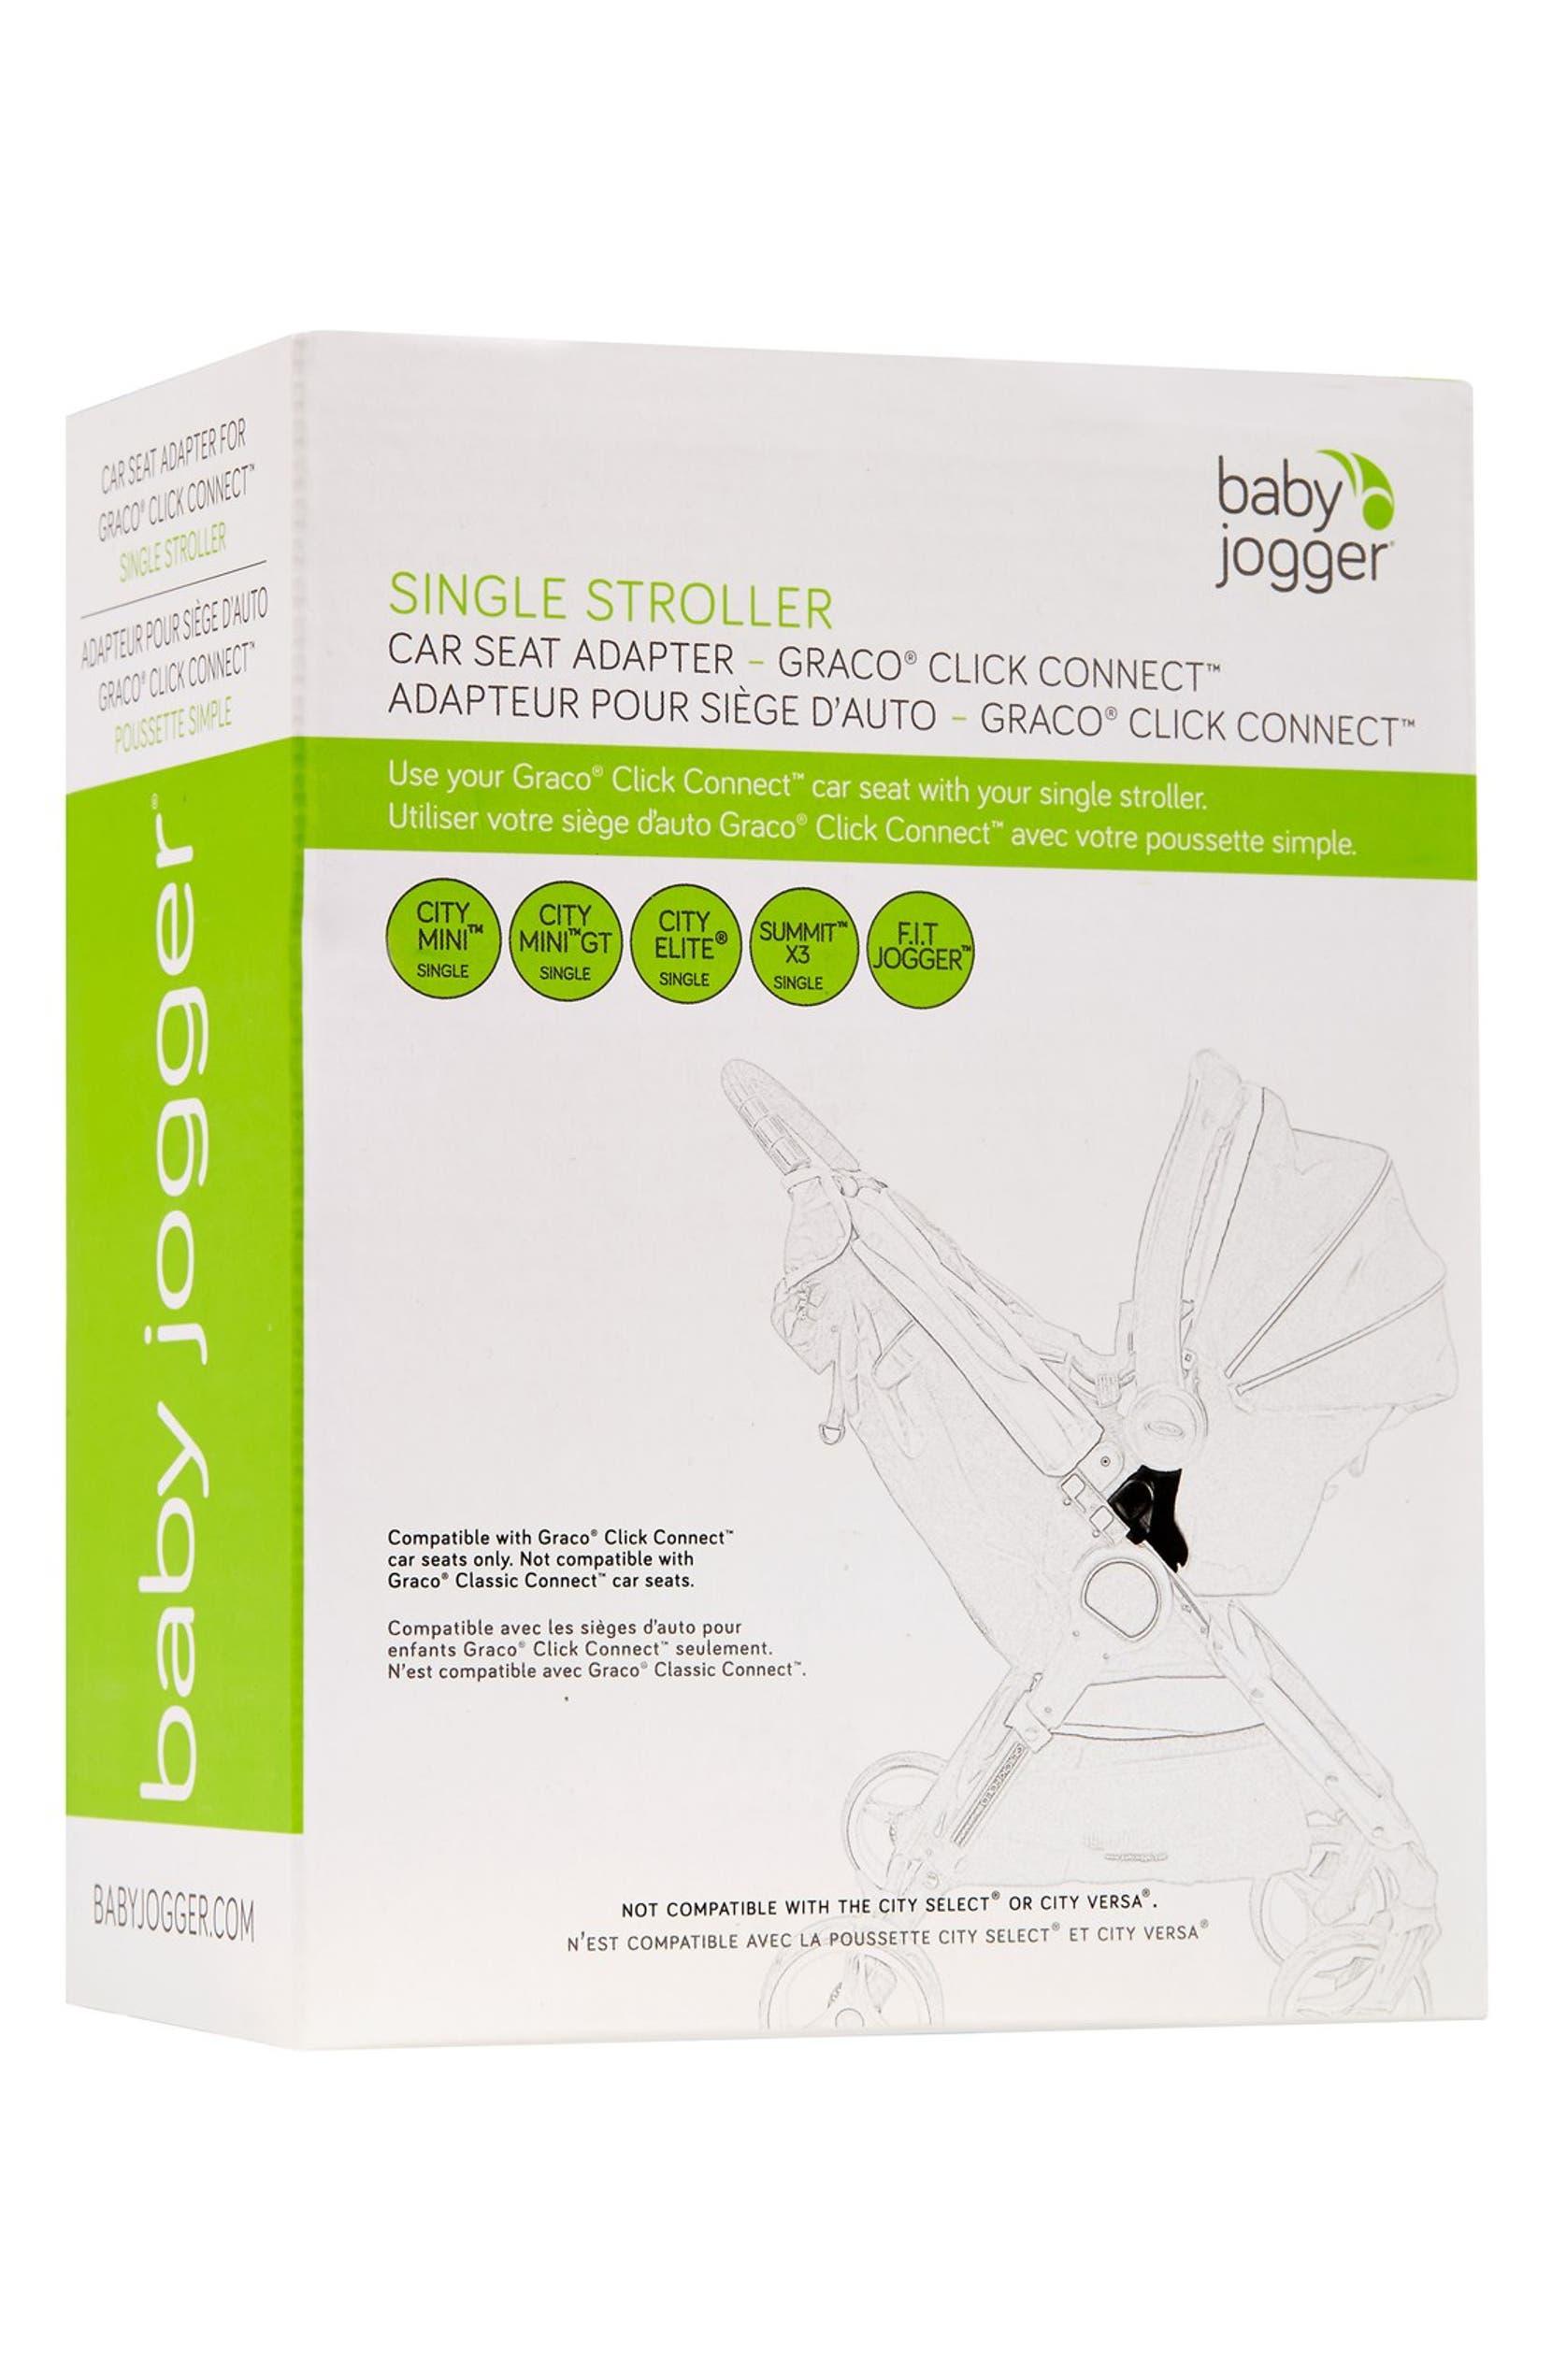 Baby Jogger Single Stroller Car Seat Adapter